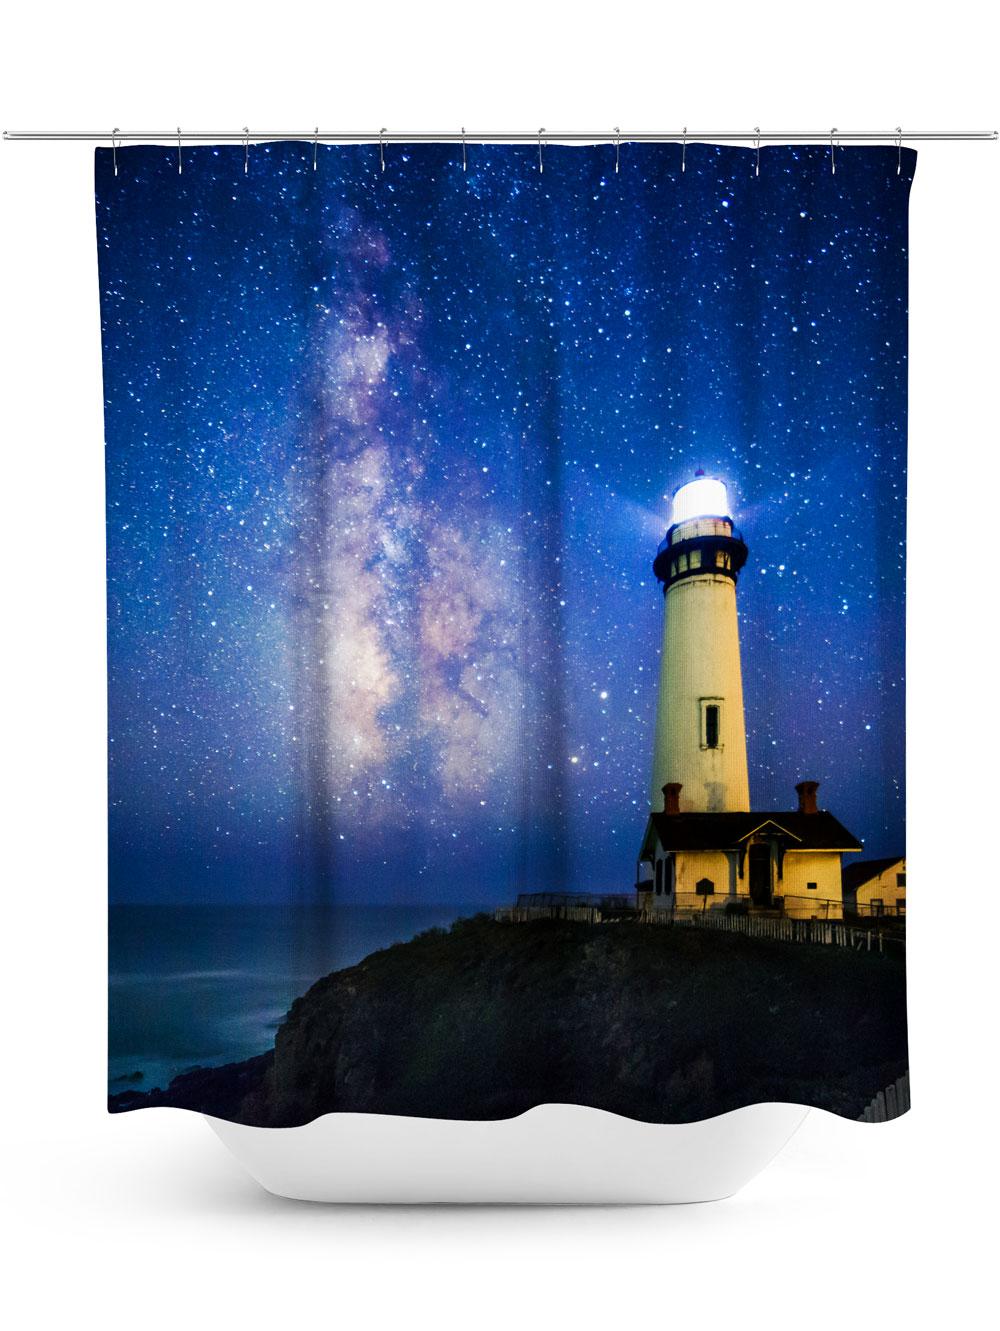 Lighthouse Photo Shower Curtain